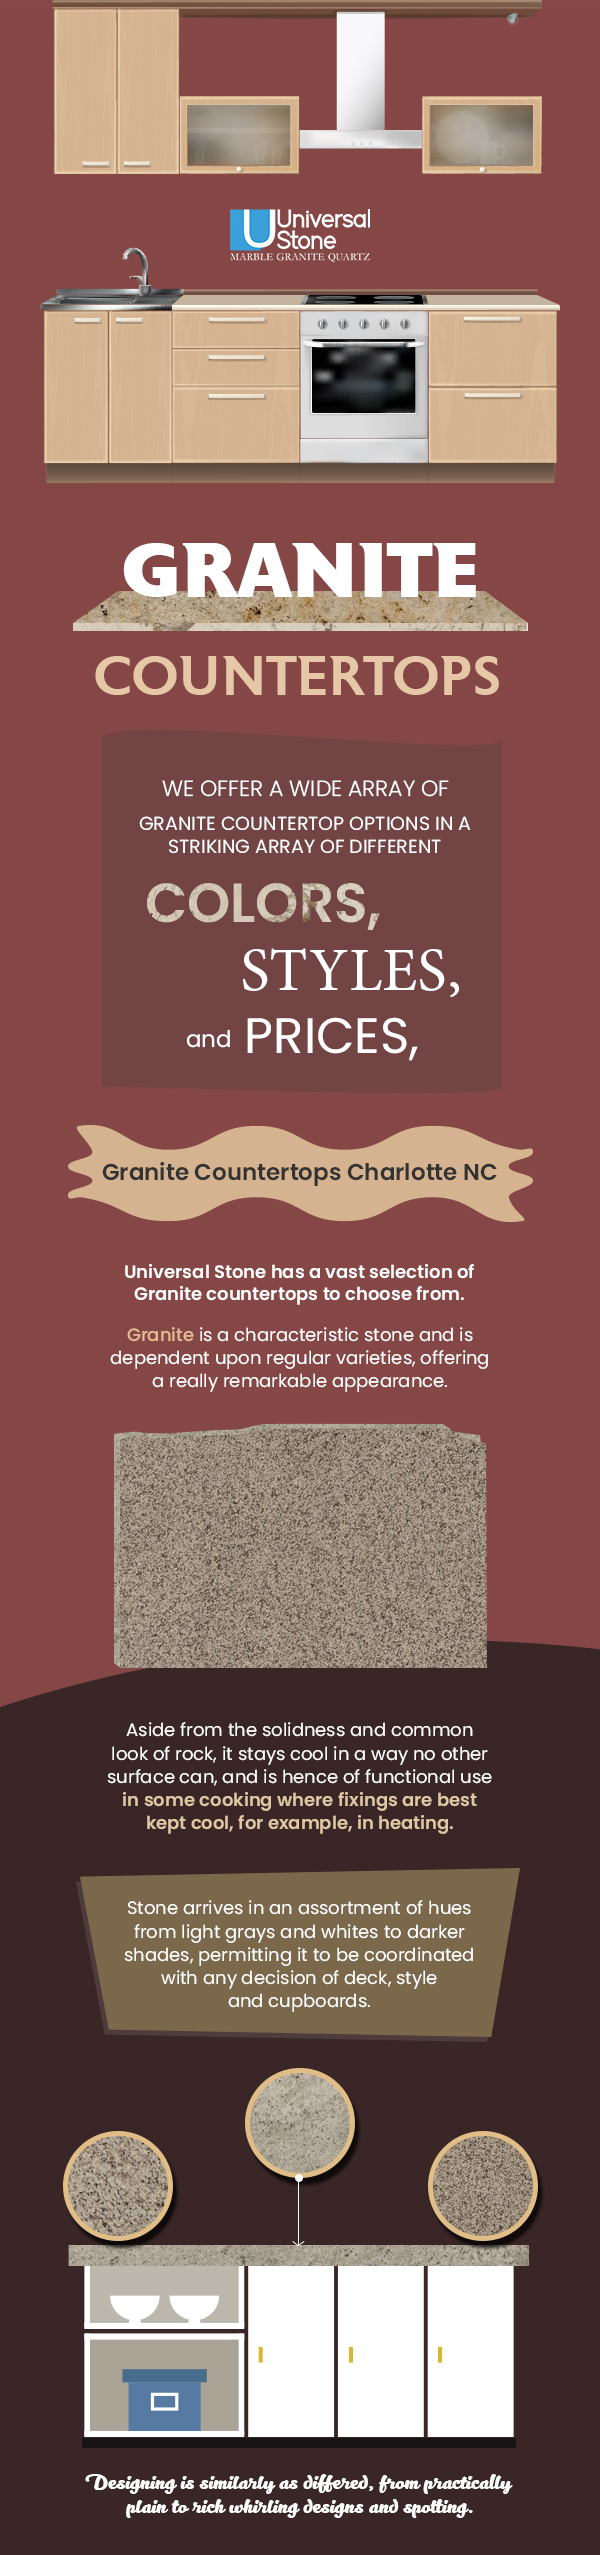 Choose Universal Stone to Buy Beautiful Range of Granite Countertops